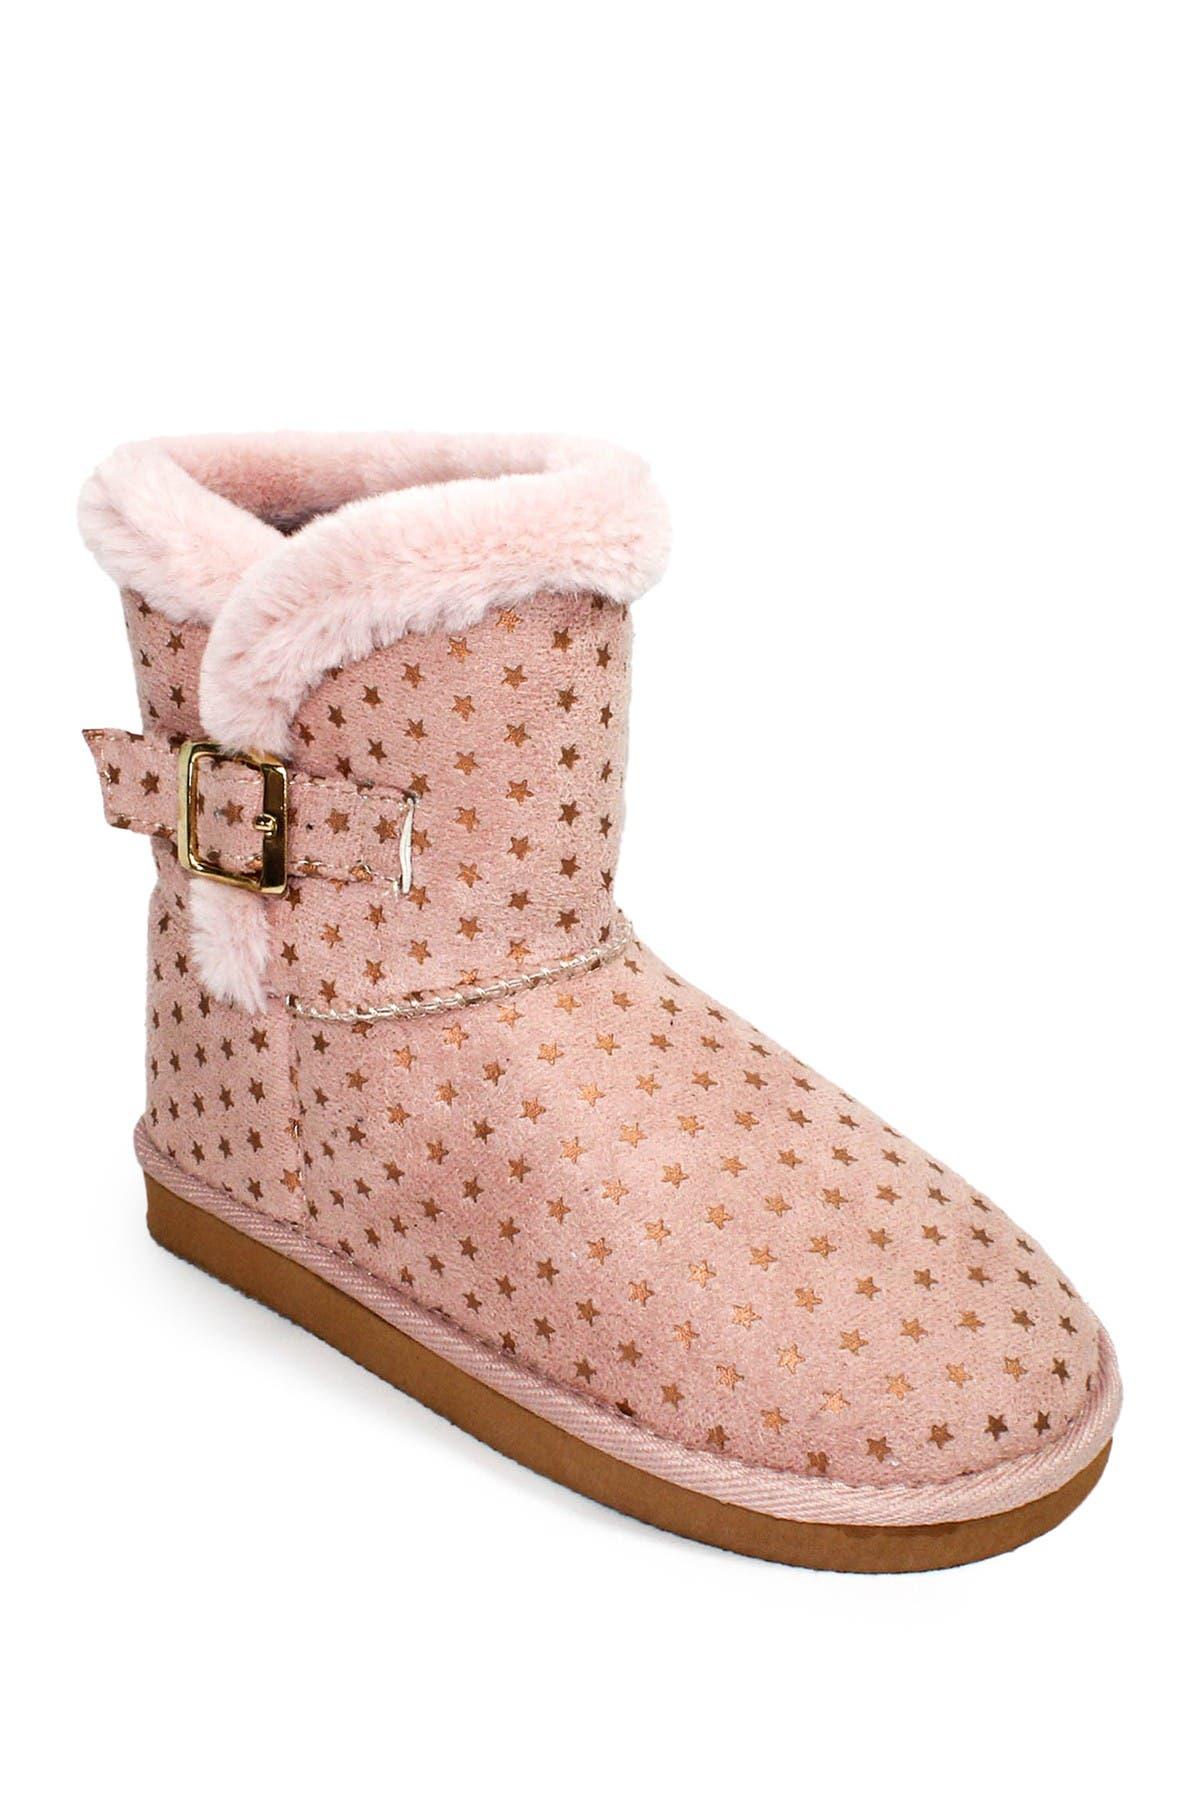 Little Girls' Shoes   Nordstrom Rack